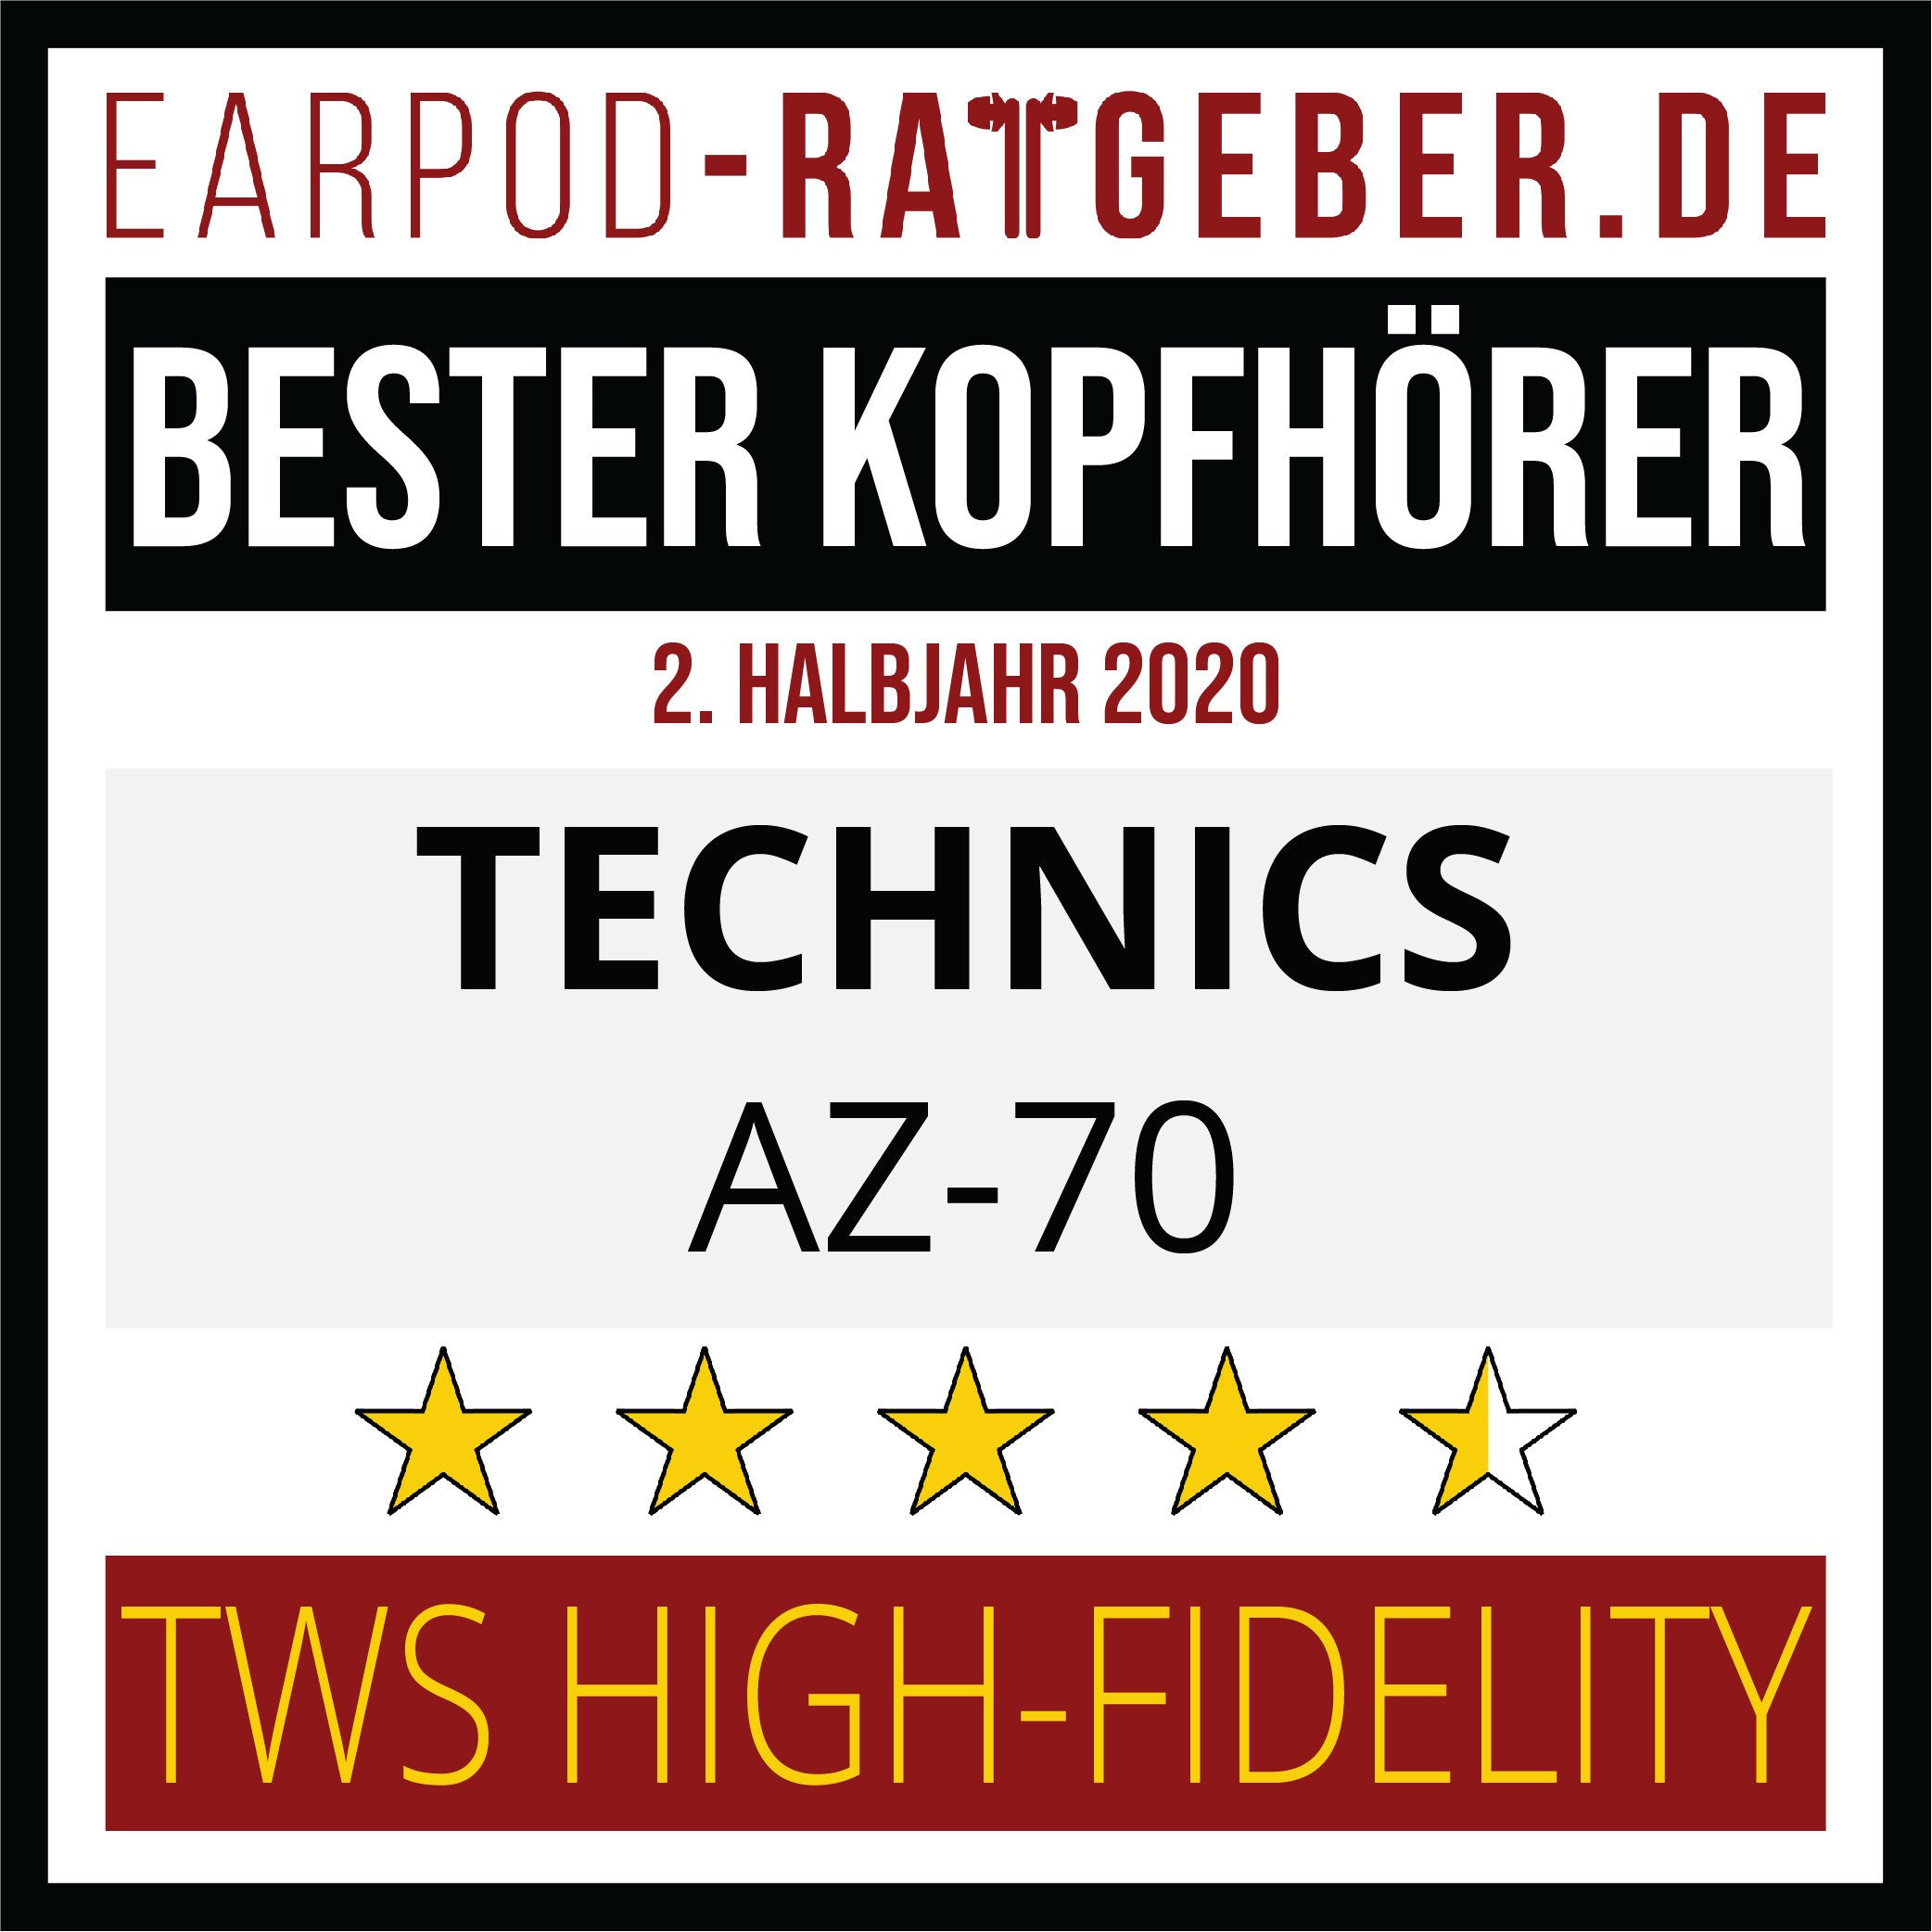 Die besten Kopfhörer 2020 Earpod-Ratgeber.de Awards Einsteiger Technics 1.hj